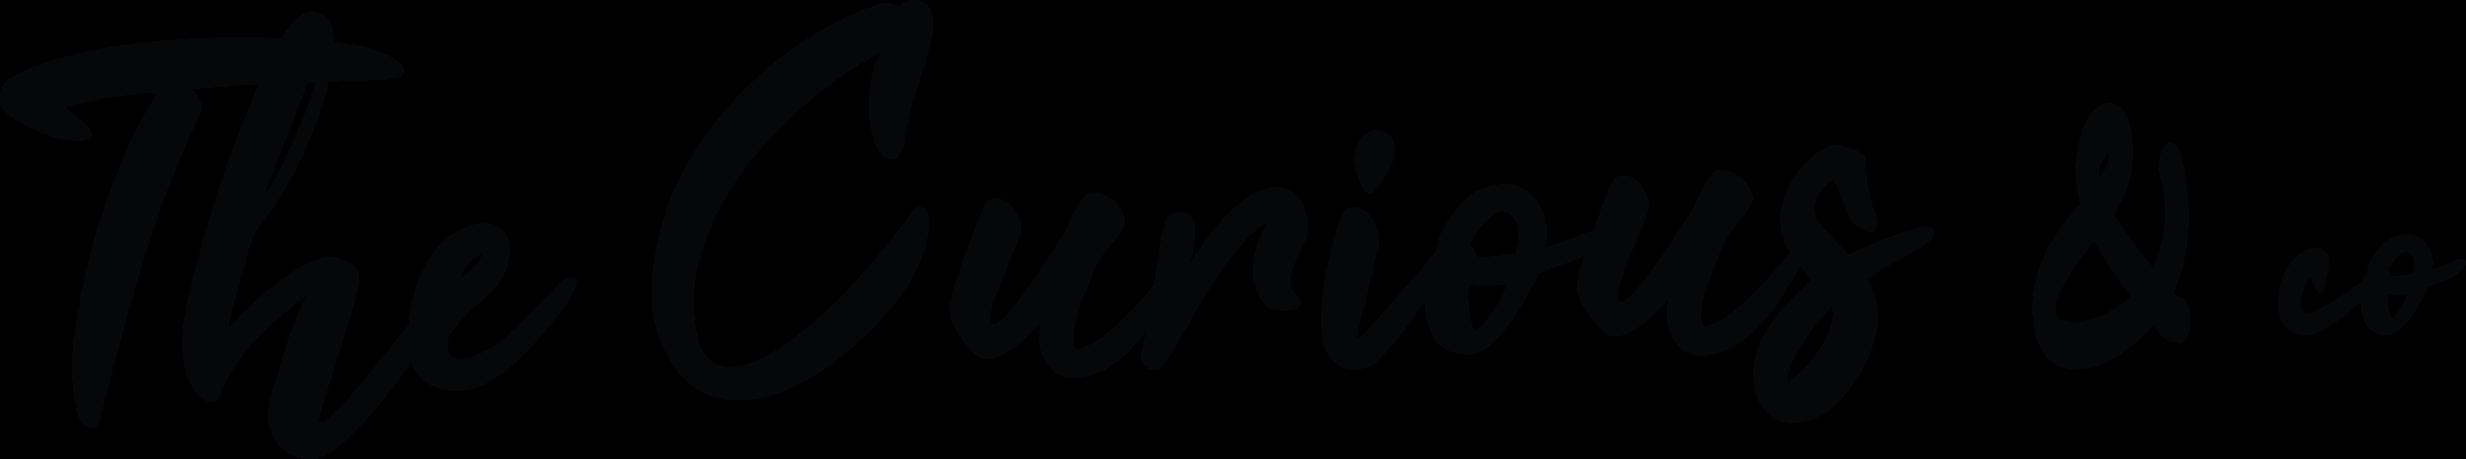 The Curious logo long black.png